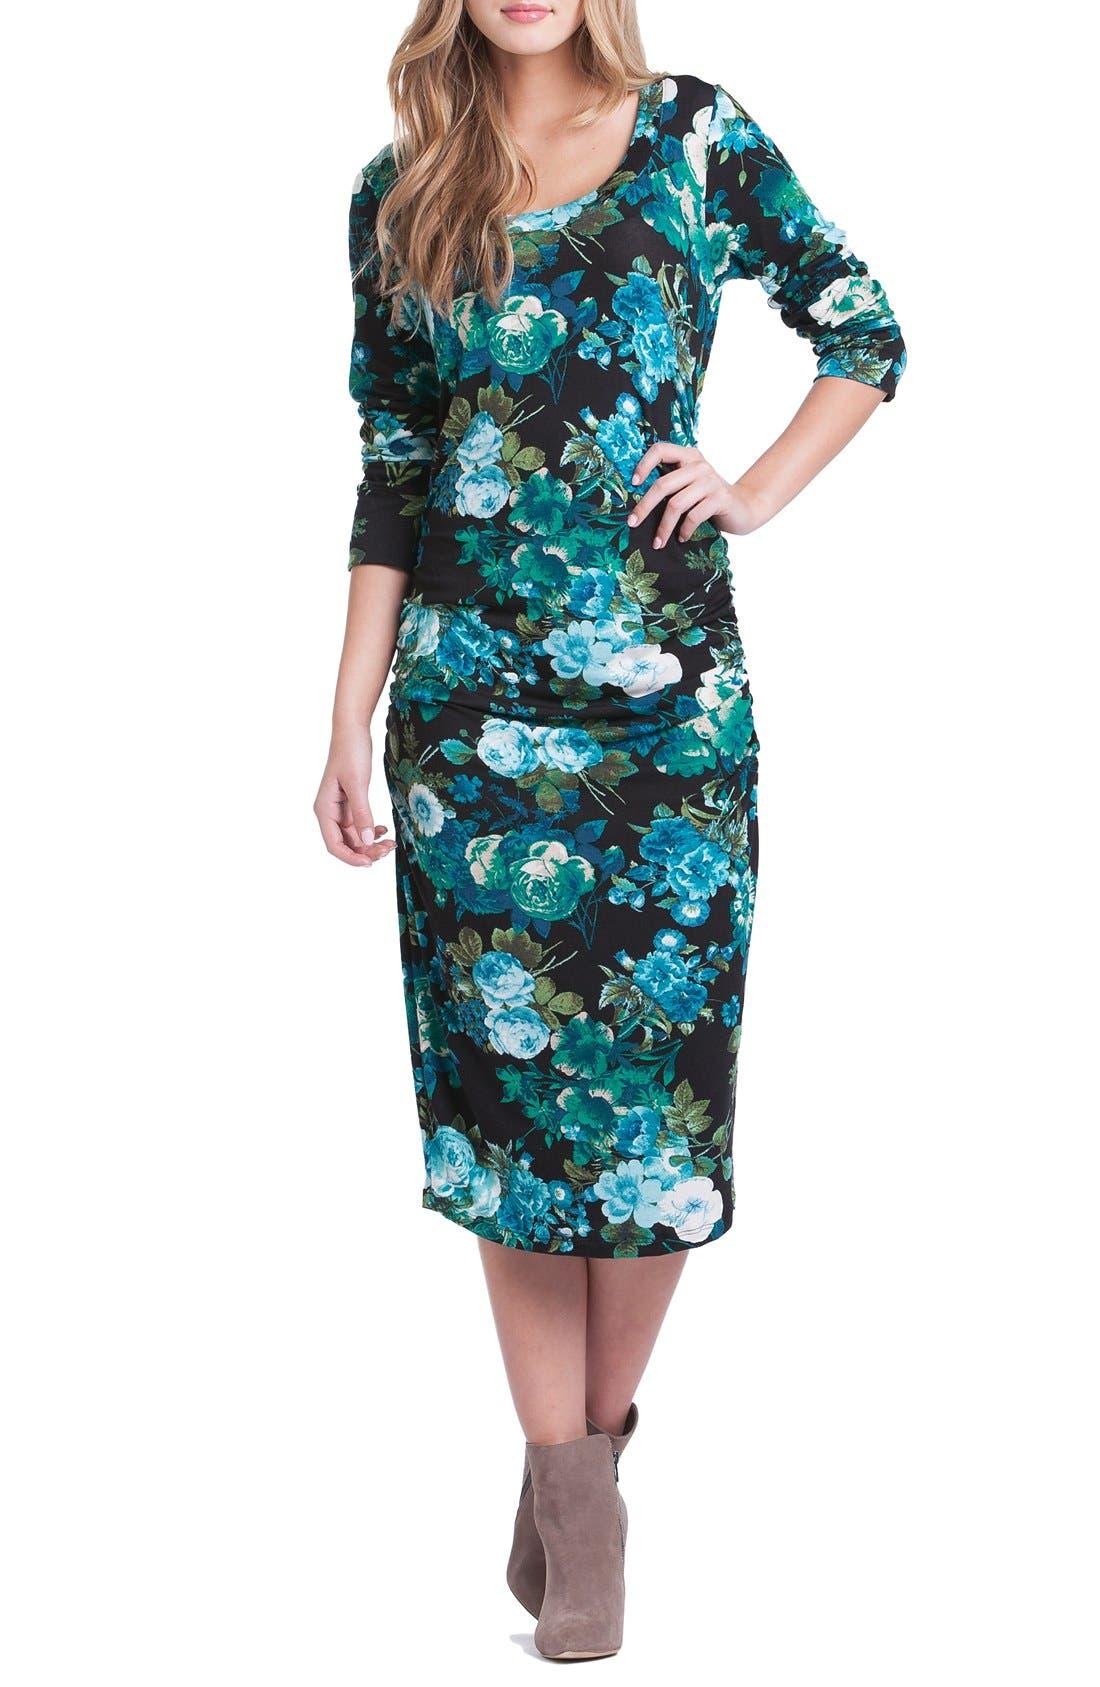 Body-Con Maternity Dress,                             Main thumbnail 1, color,                             Blue Floral